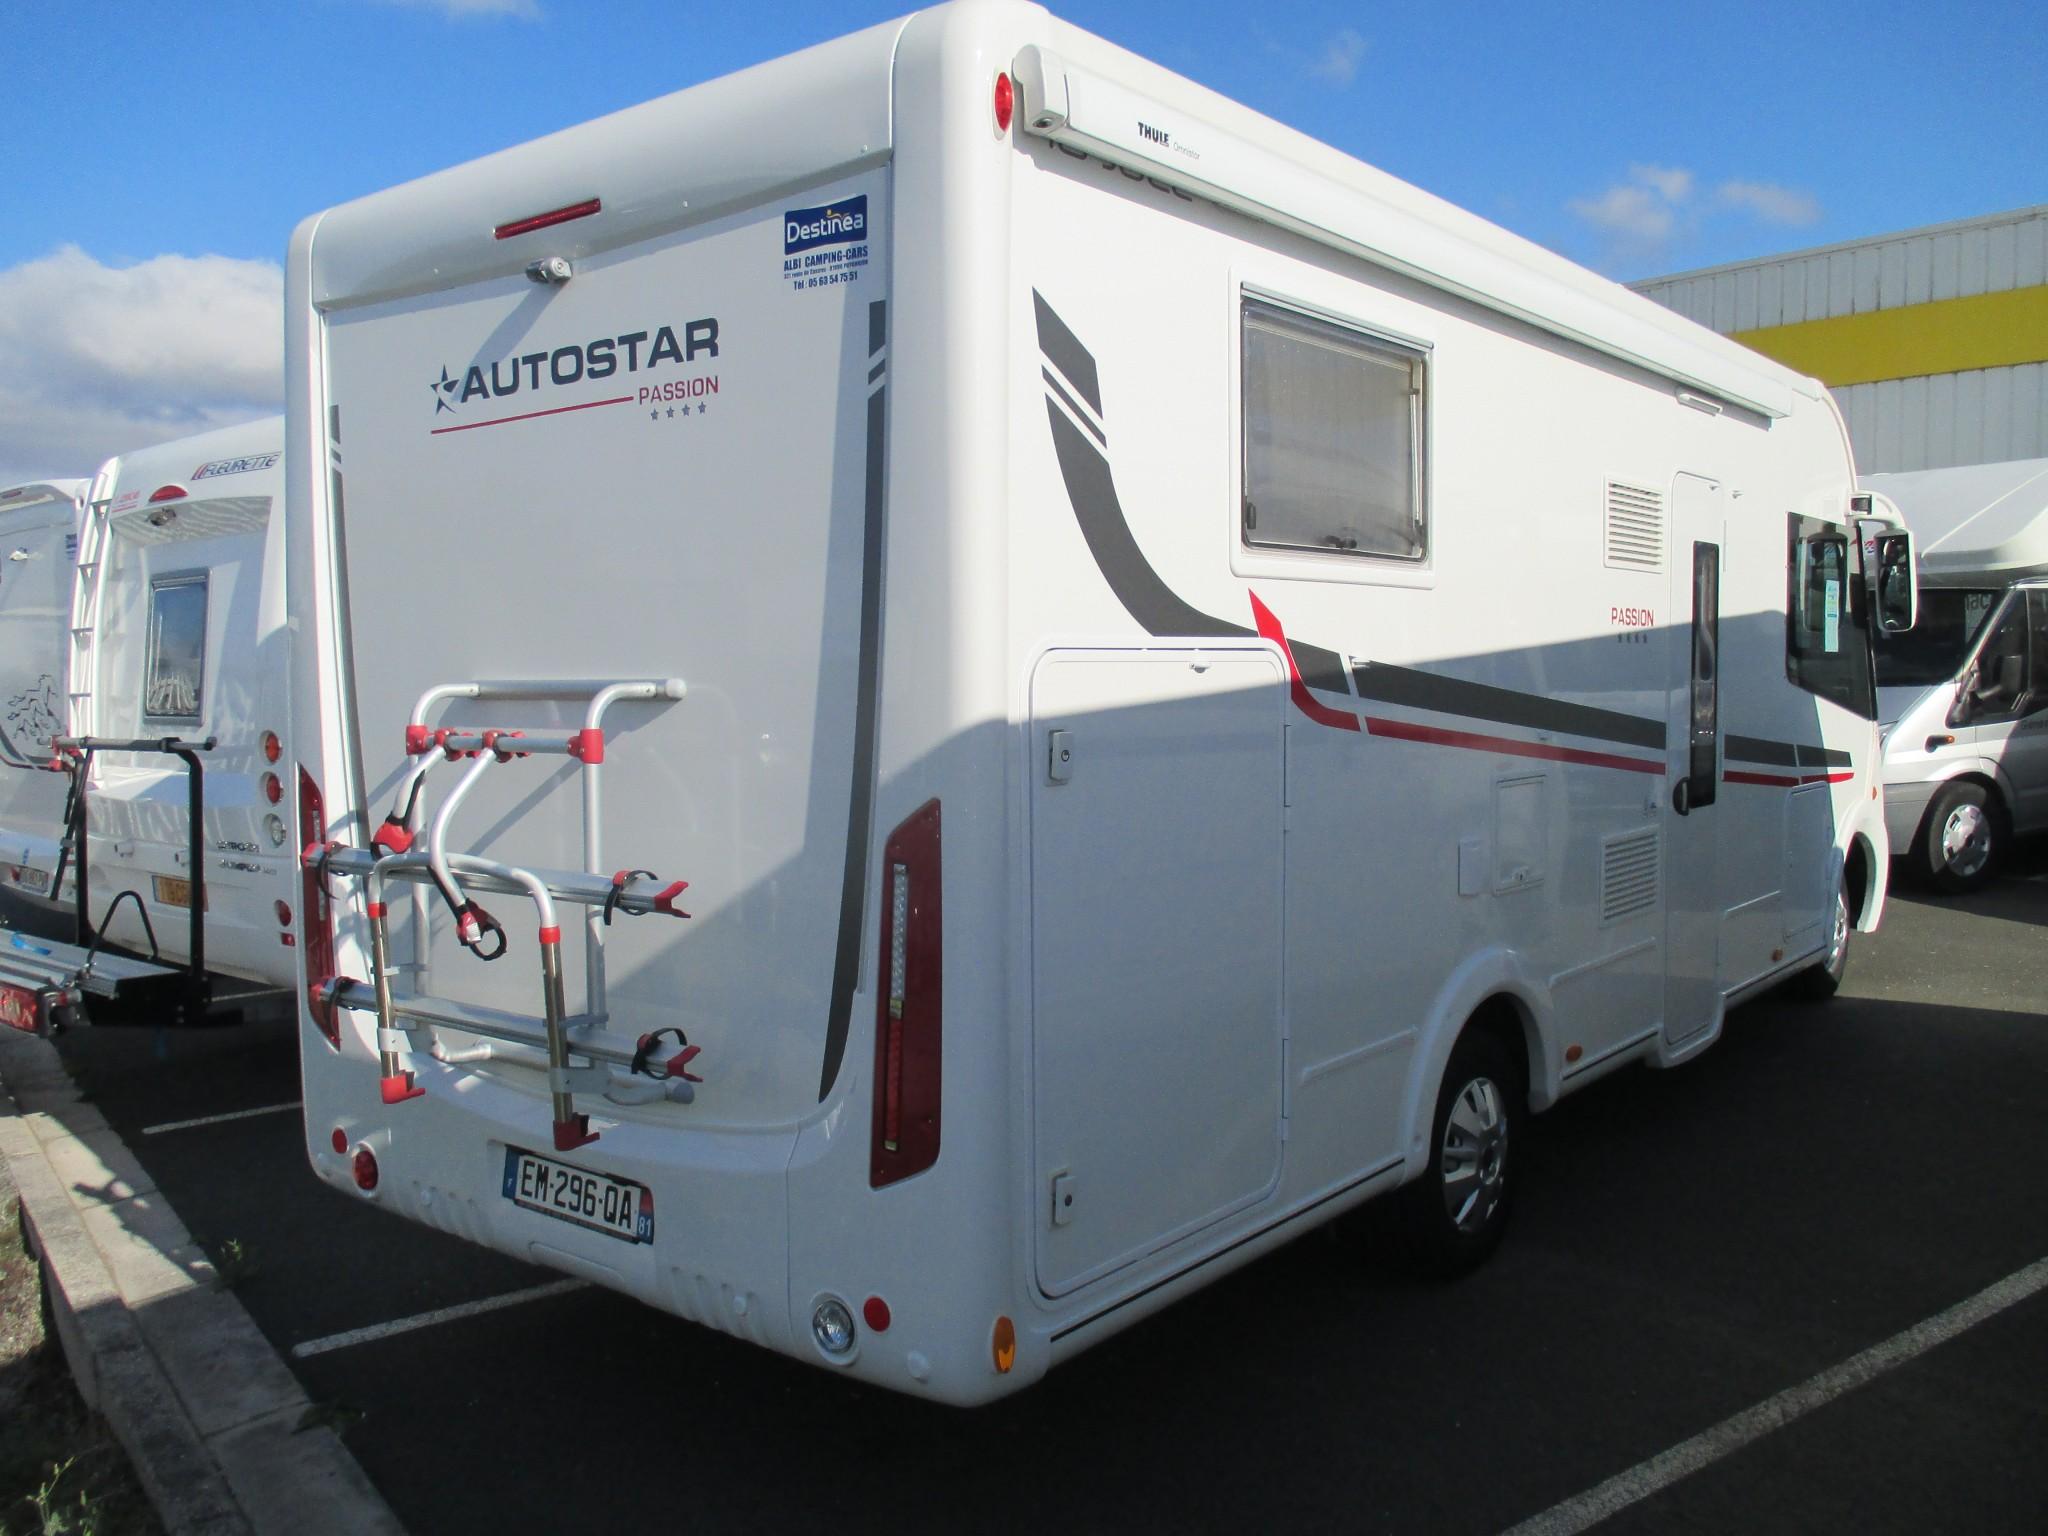 Autostar I690 Lc Passion - 6